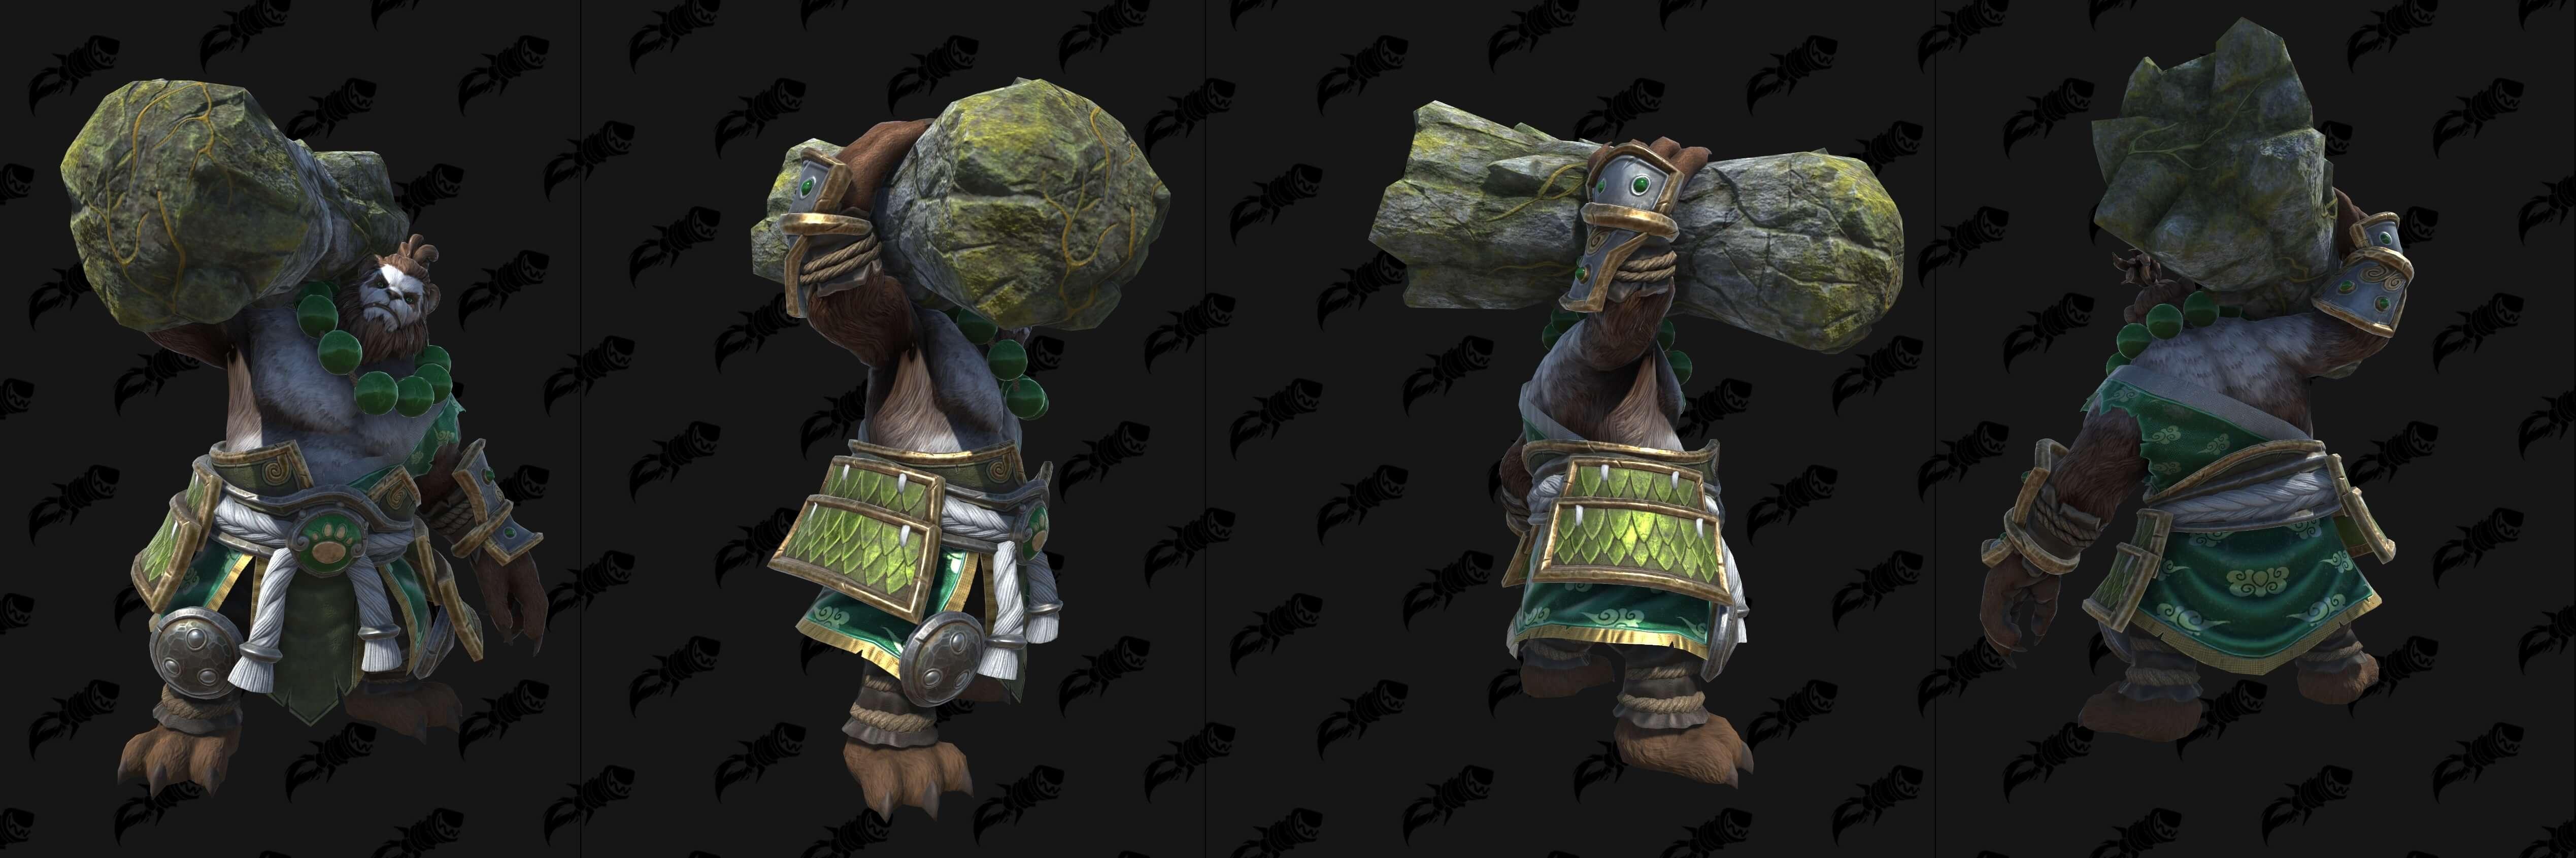 Пандарен-хмелевар (Земля) Warcraft lll: Reforged